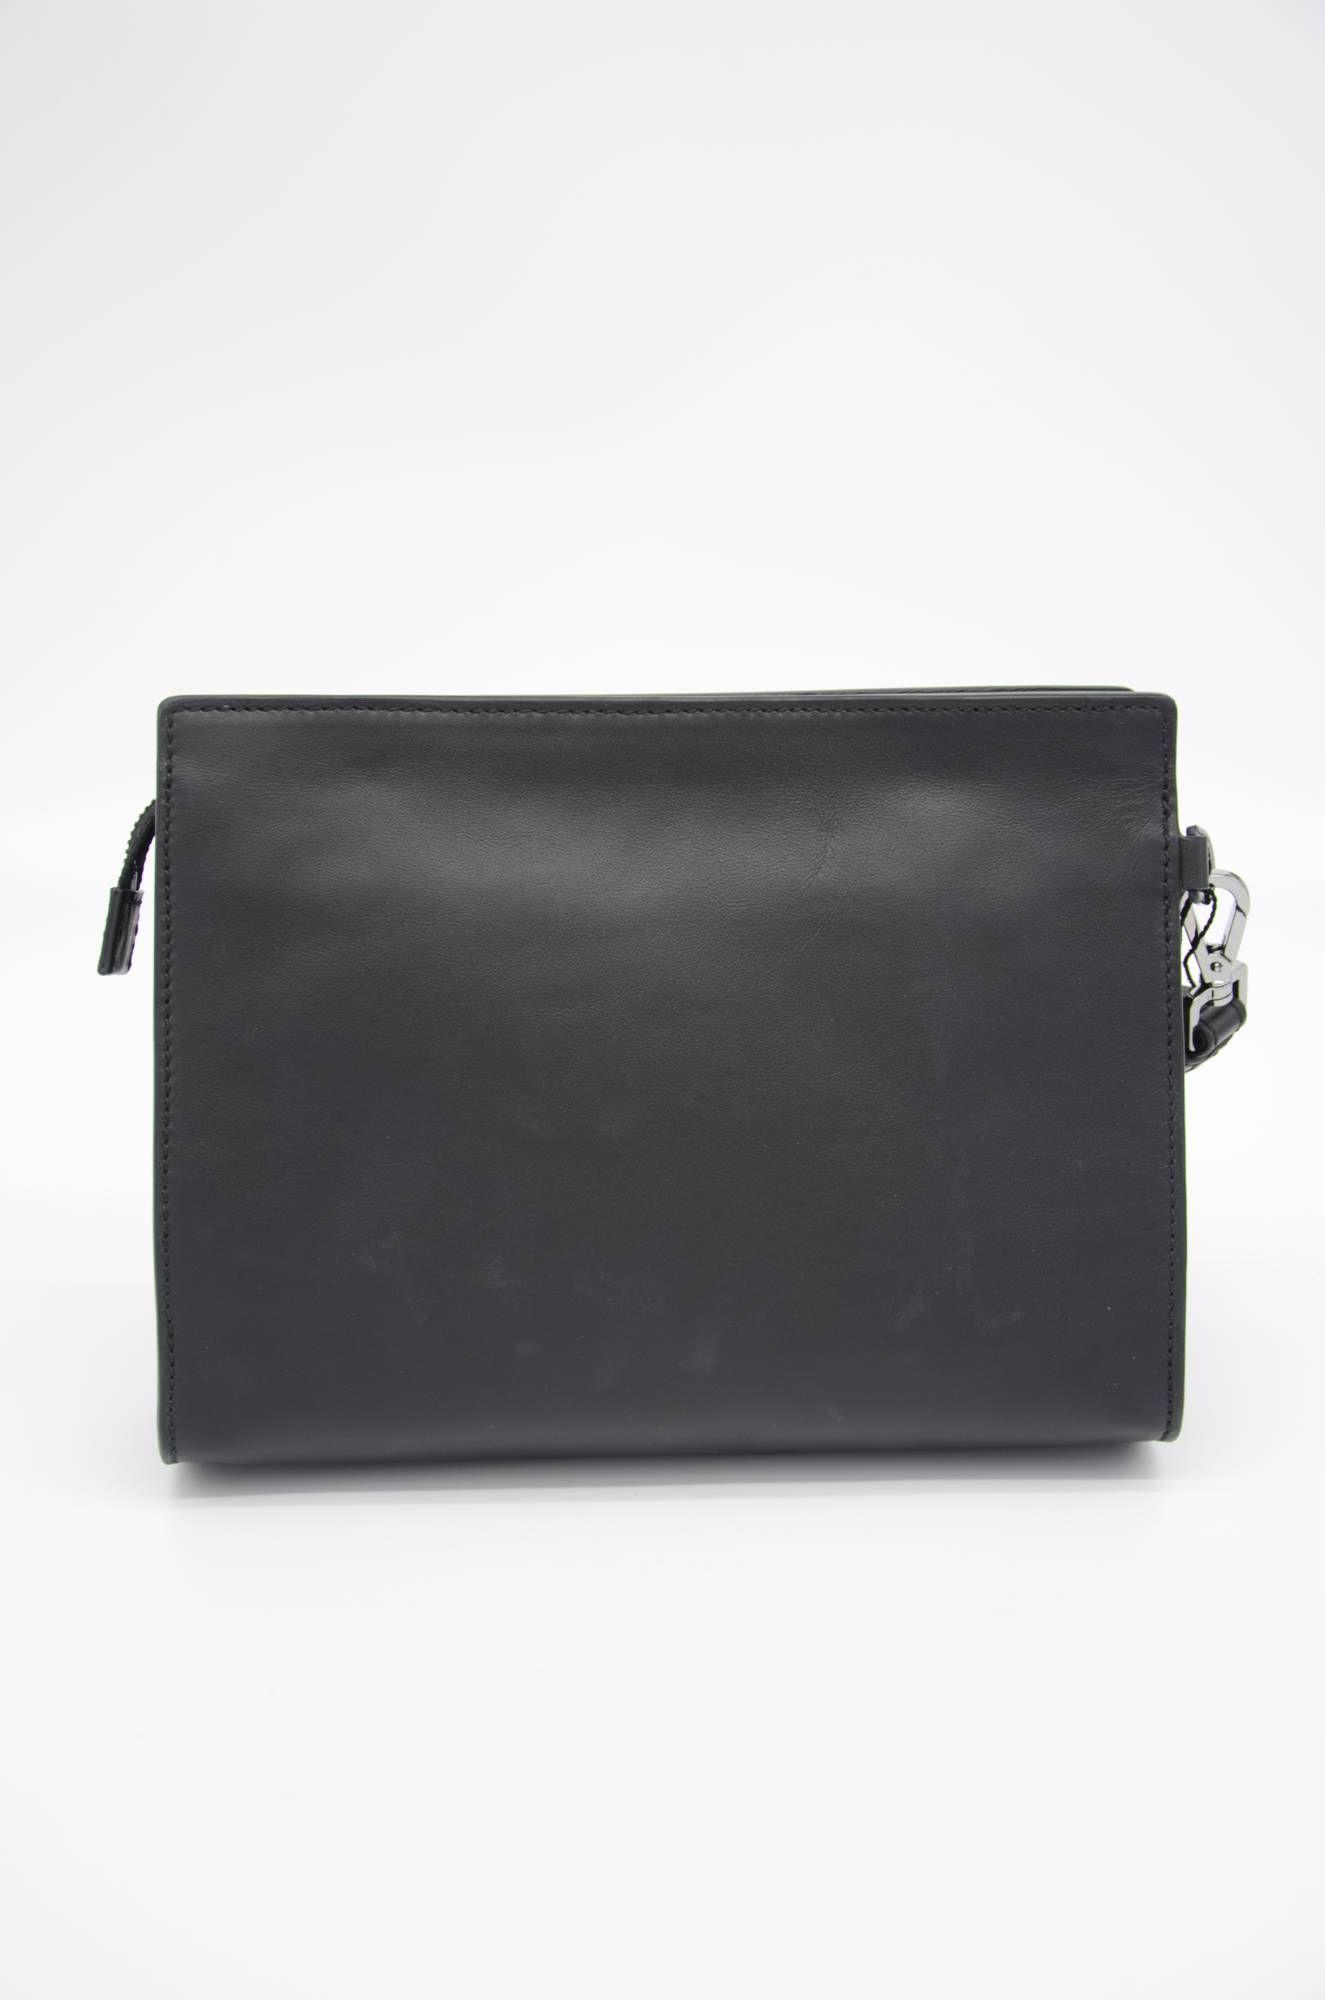 Dolce & Gabbana Men Leather Clutch Bag